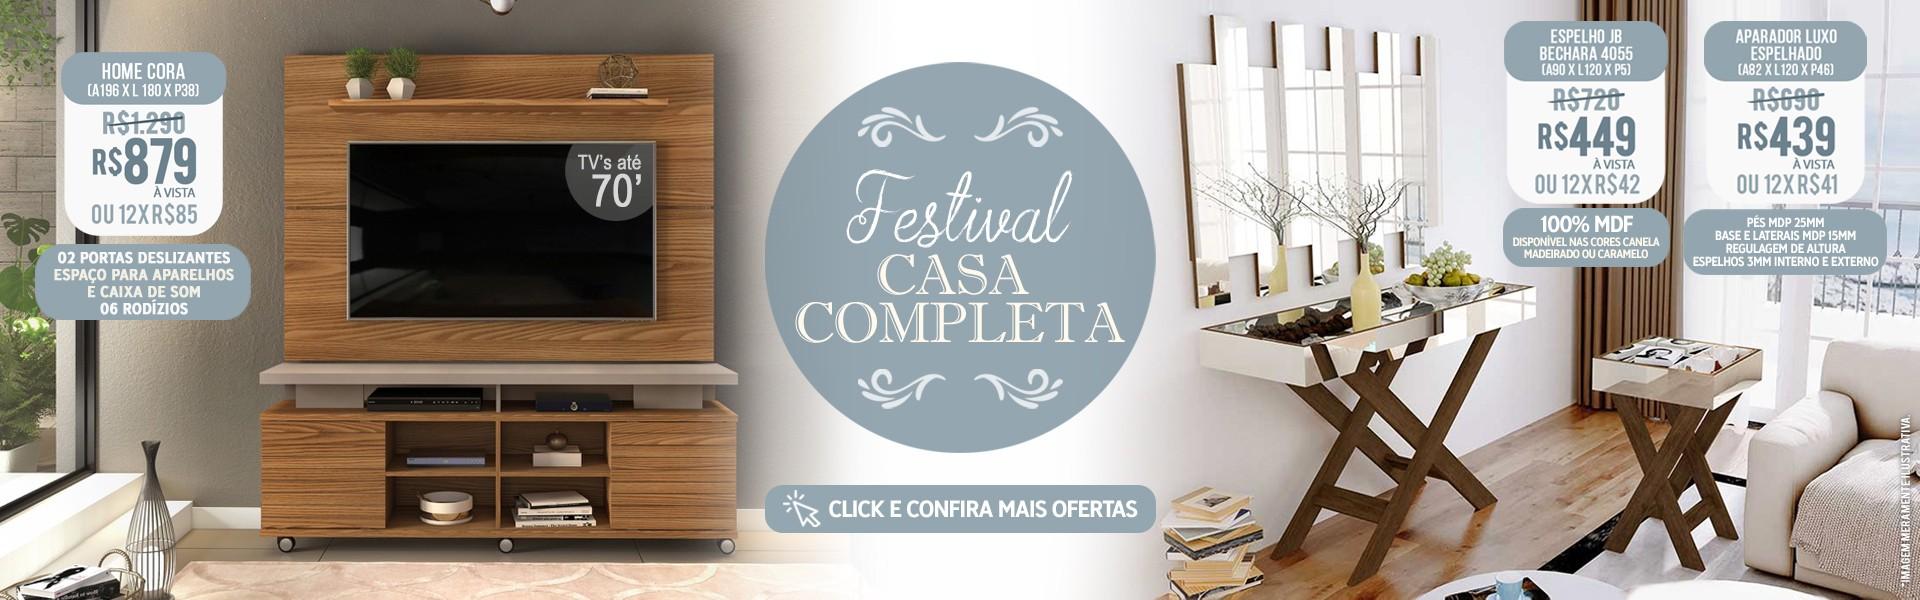 FESTIVAL CASA COMPLETA